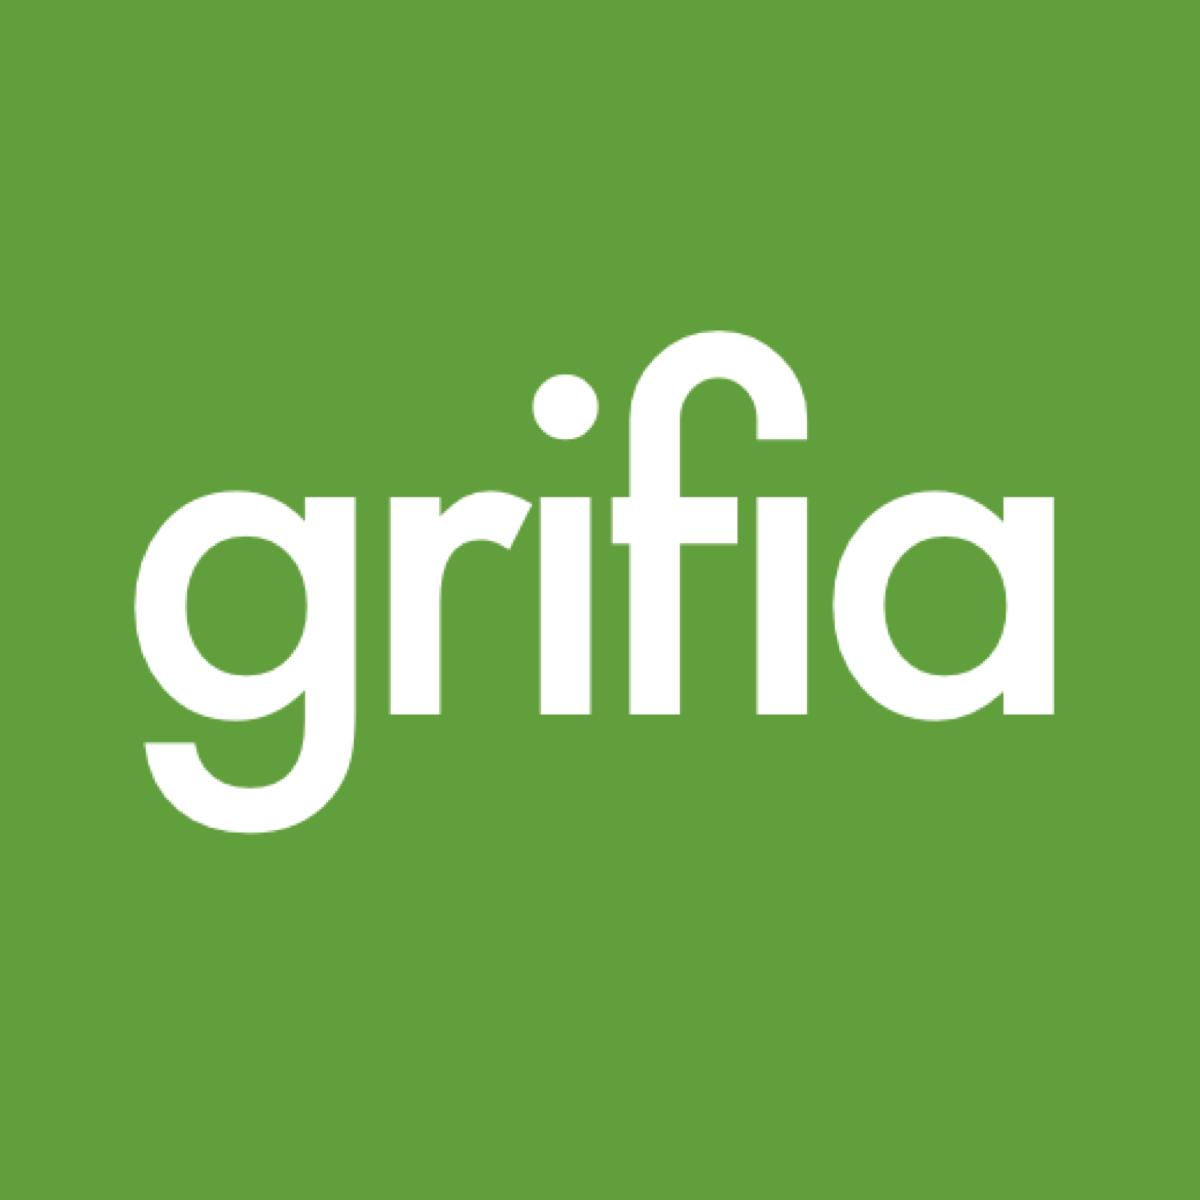 Grifia logo